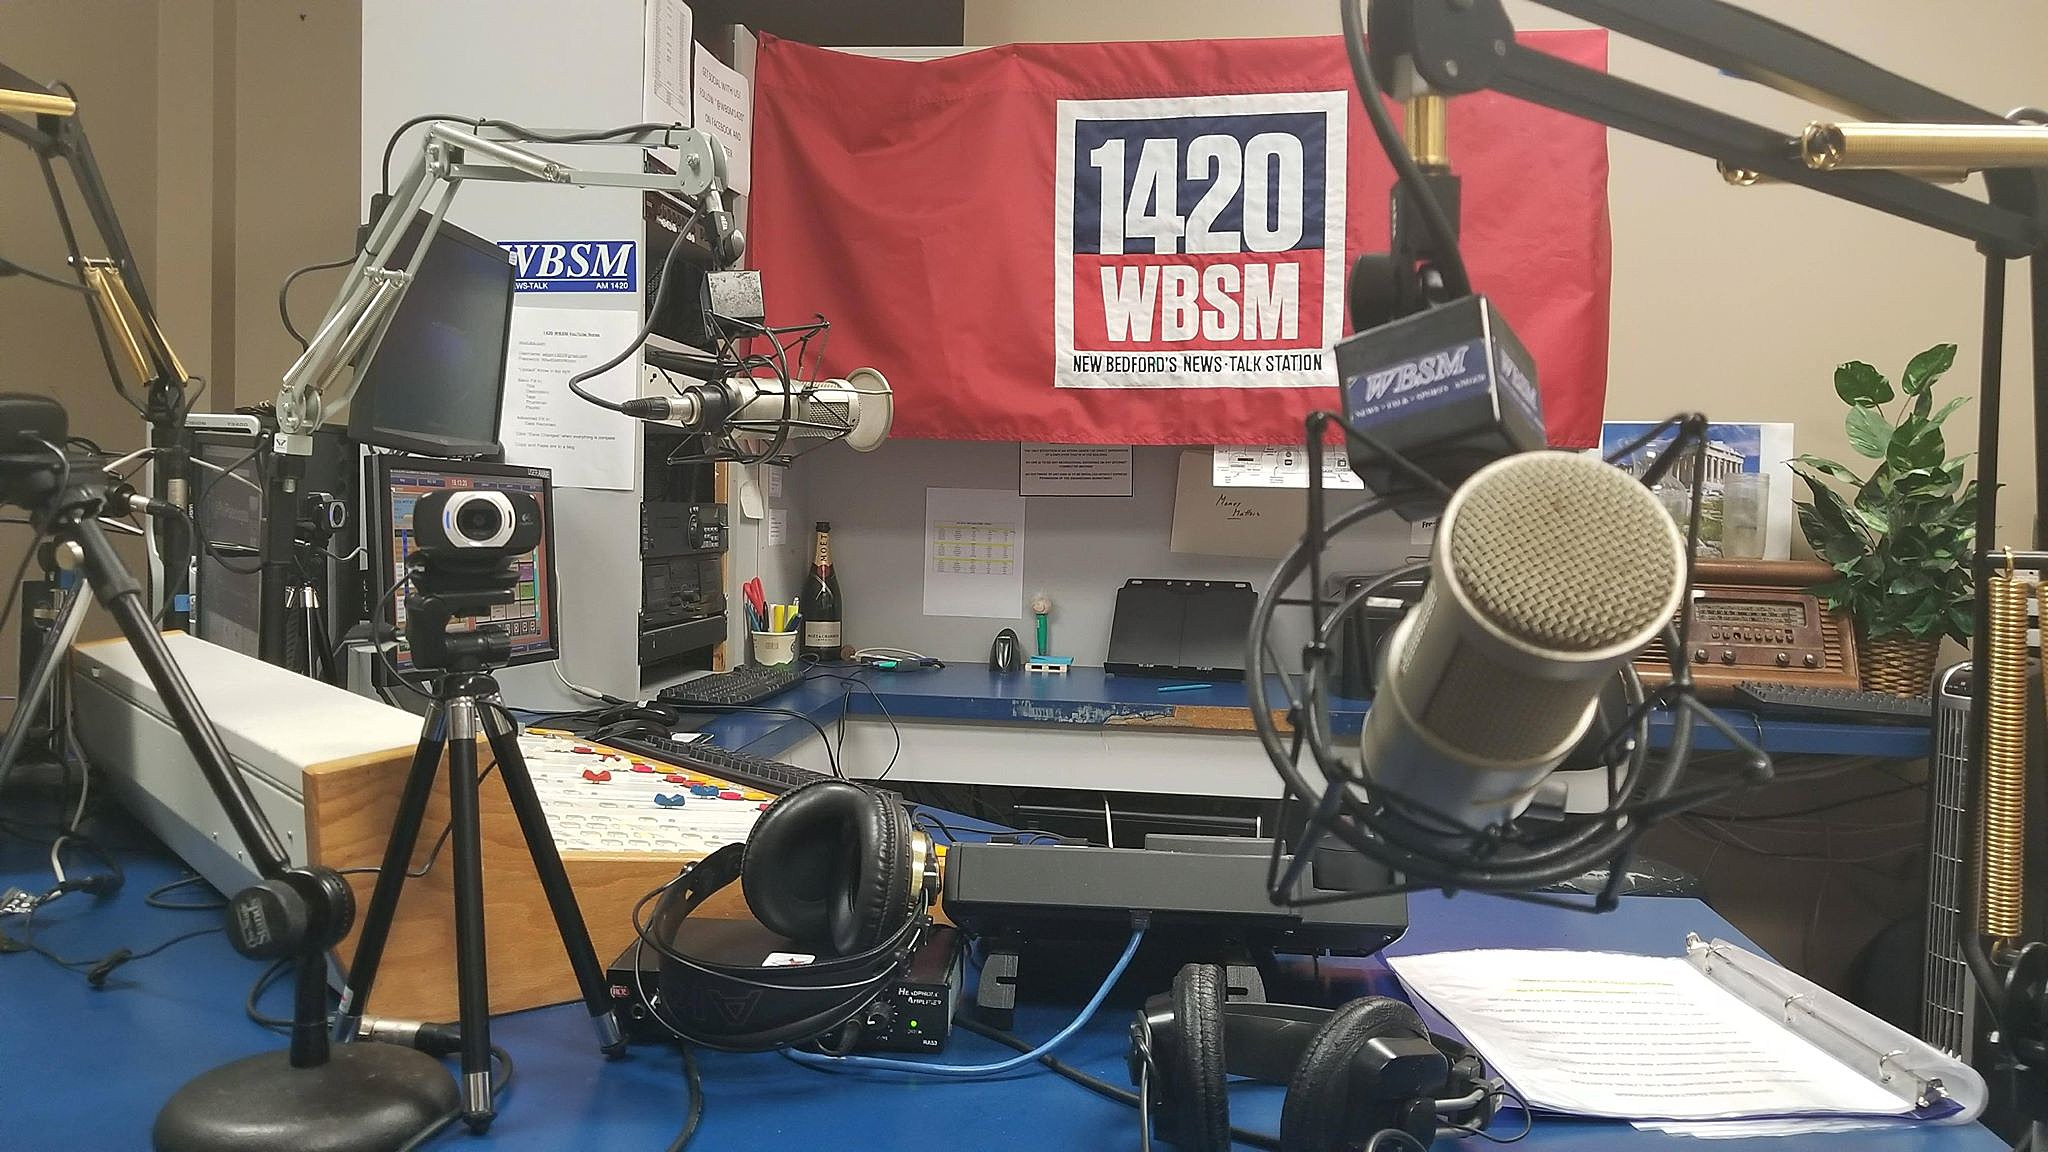 Live - 1420 WBSM